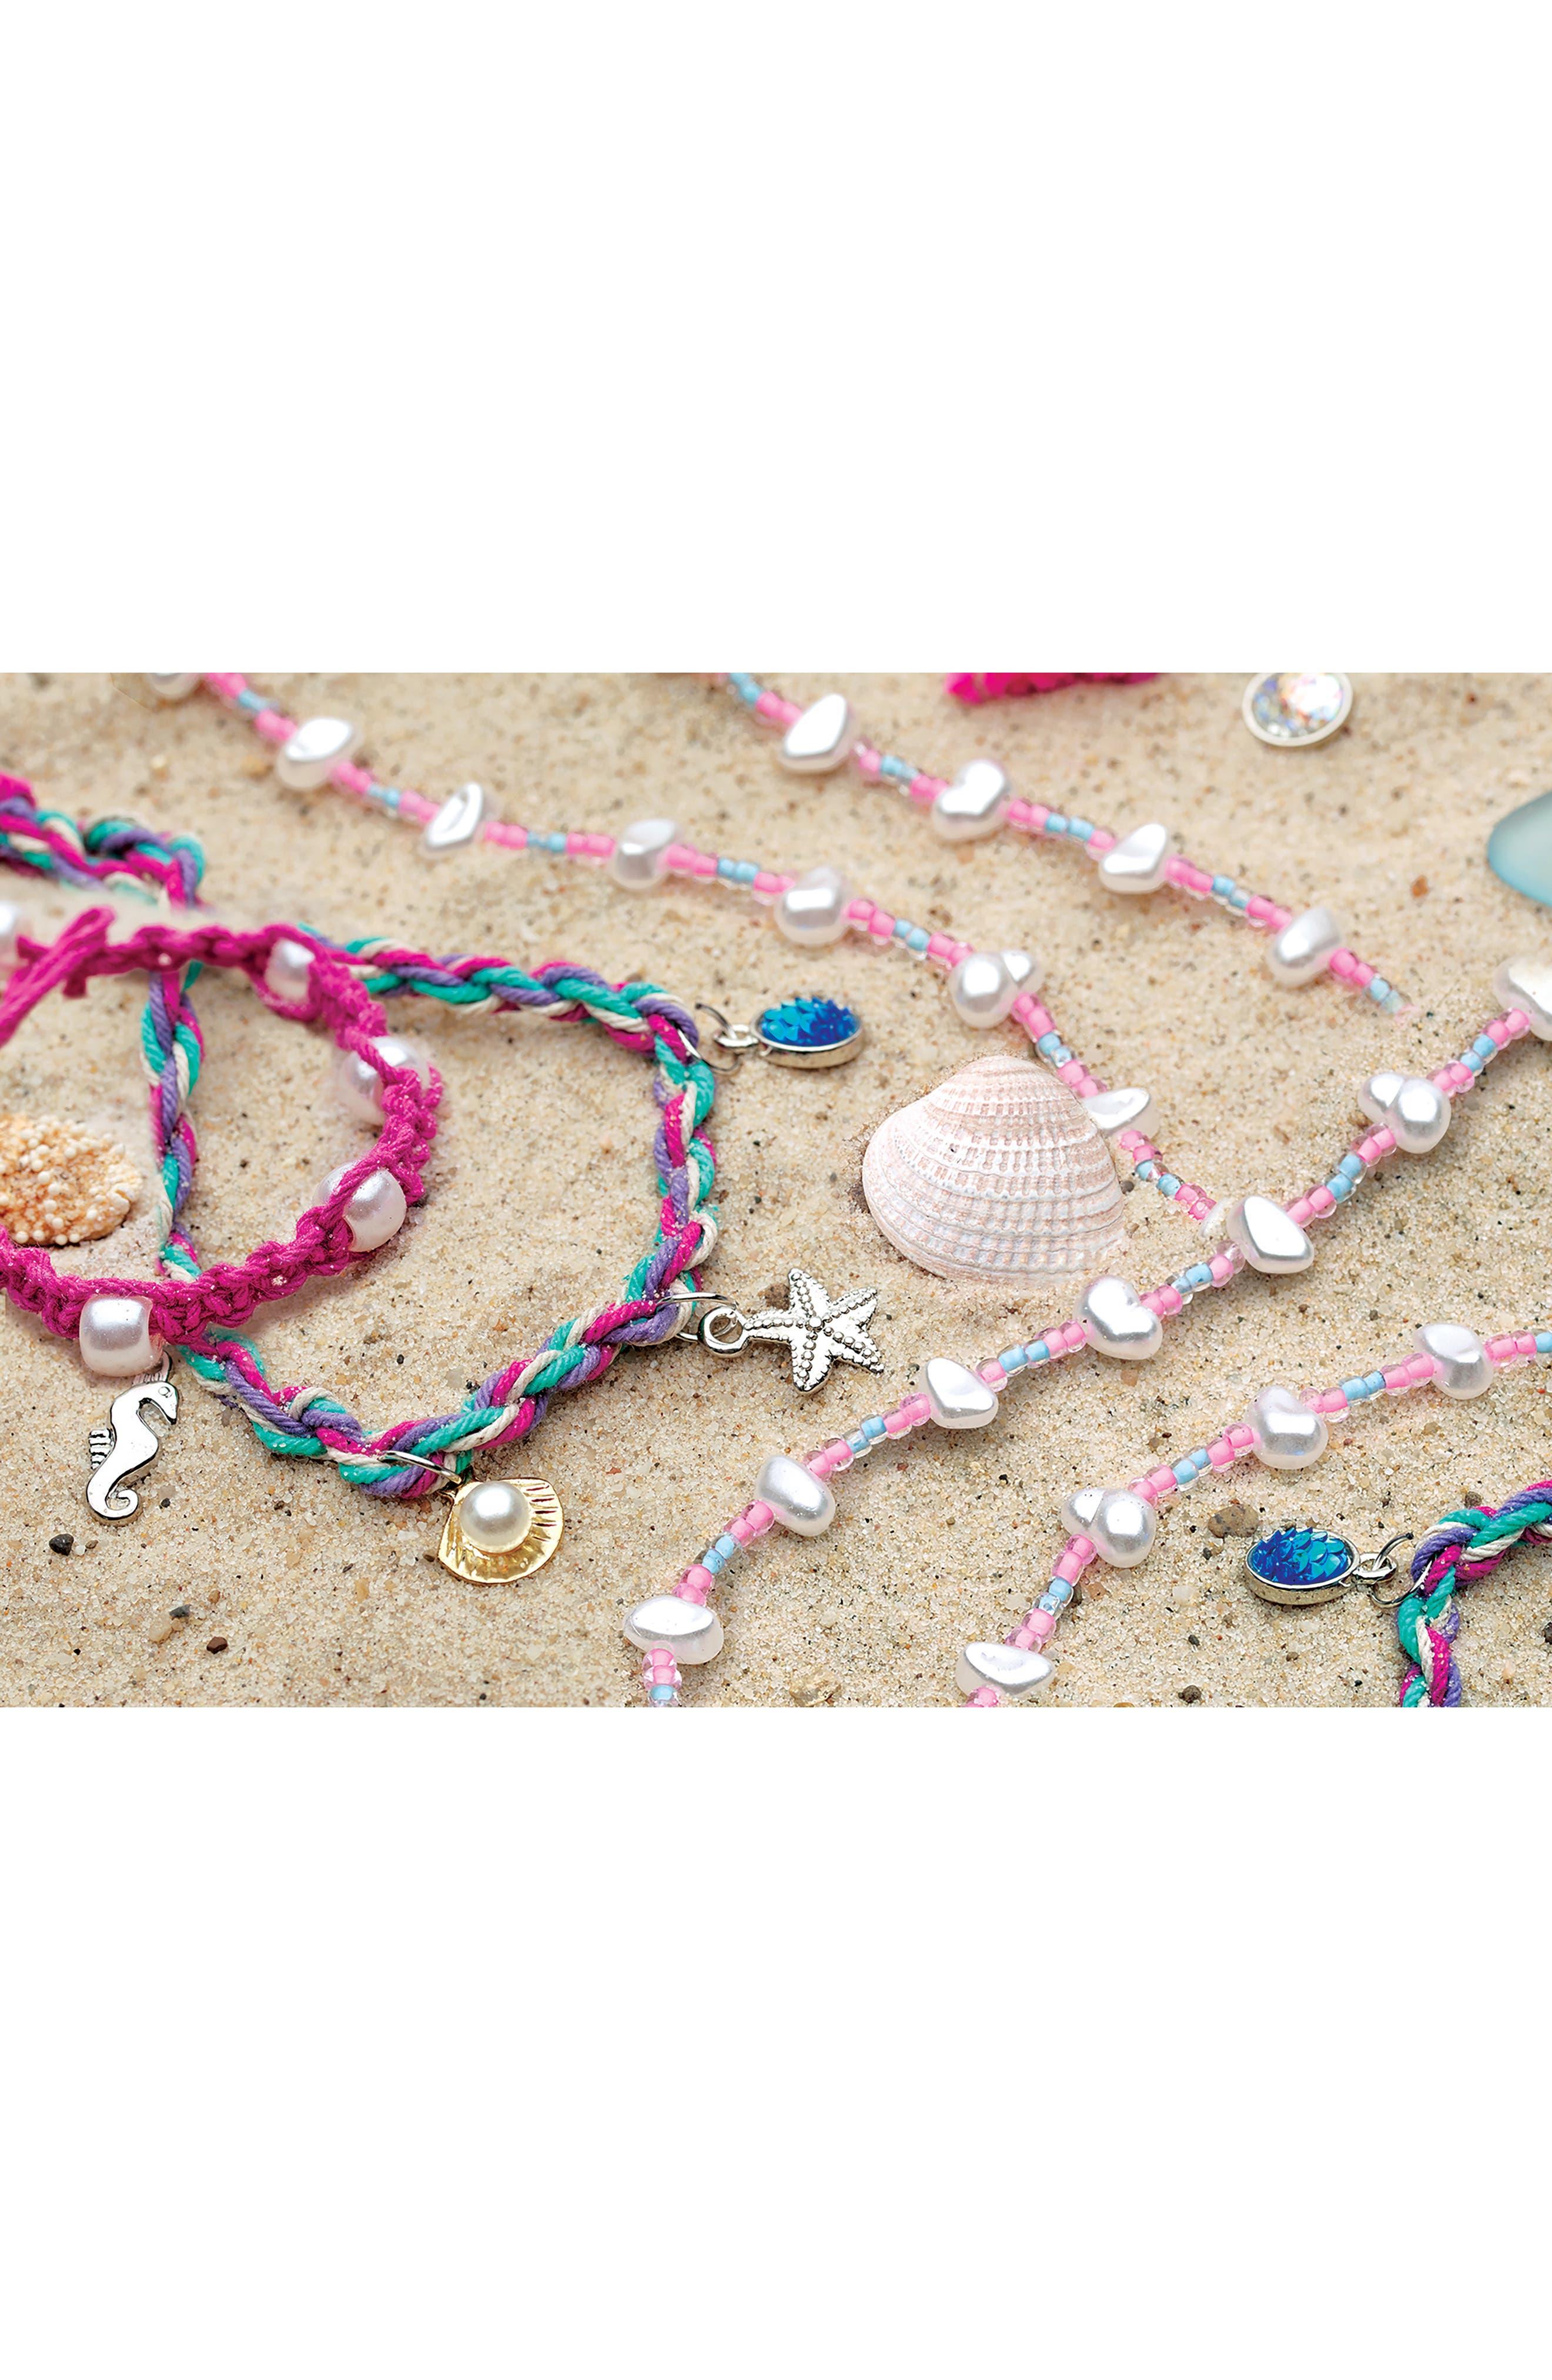 Mermaid Tail Jewelry Maker,                             Alternate thumbnail 4, color,                             450